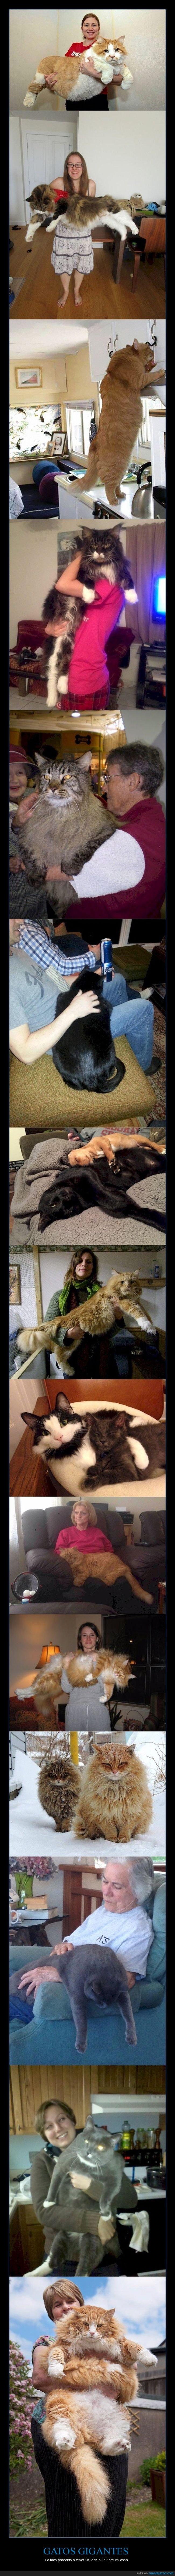 gatos,gigantes